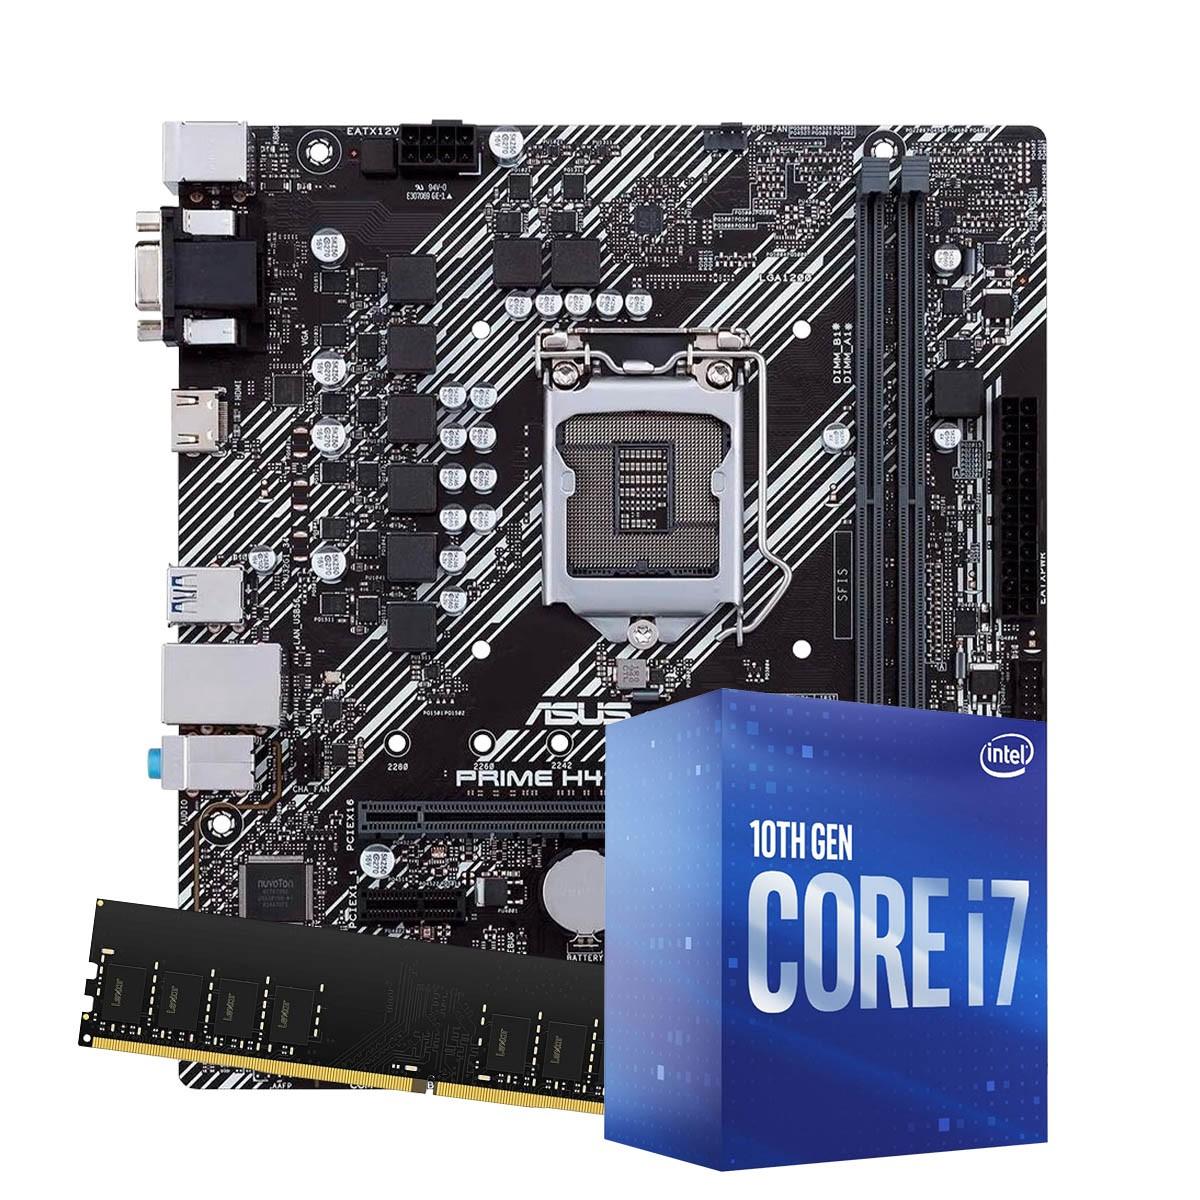 Kit Upgrade intel 10º geração corei7-10700 2.9ghz ,Placa Mãe Asrock H410M-HVS LGA 1200, 8GB DDR4